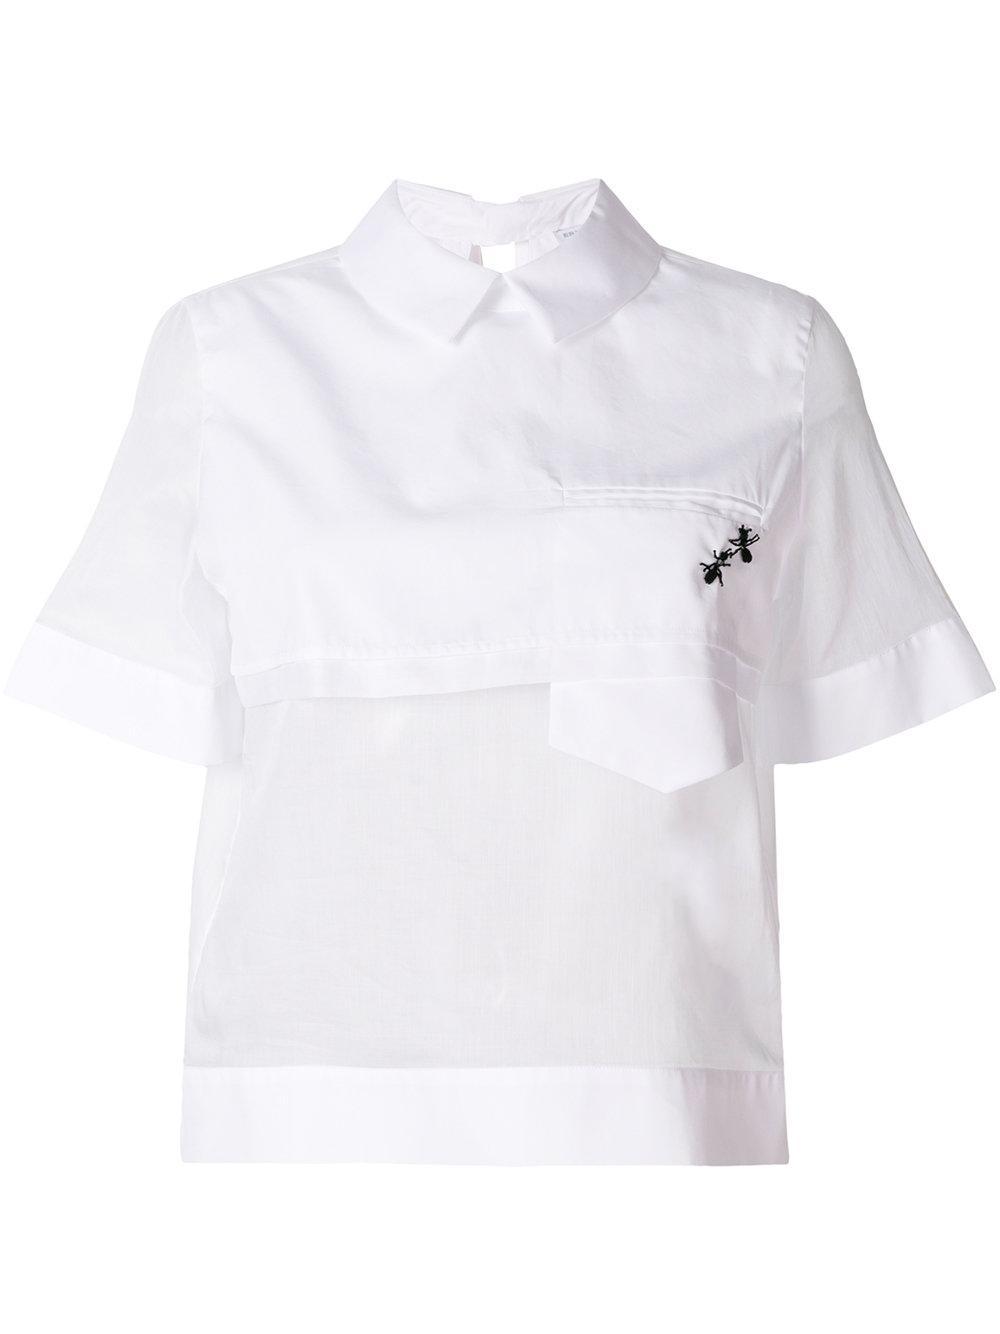 Ermanno Scervino Asymmetric Ants Embellished Blouse - White